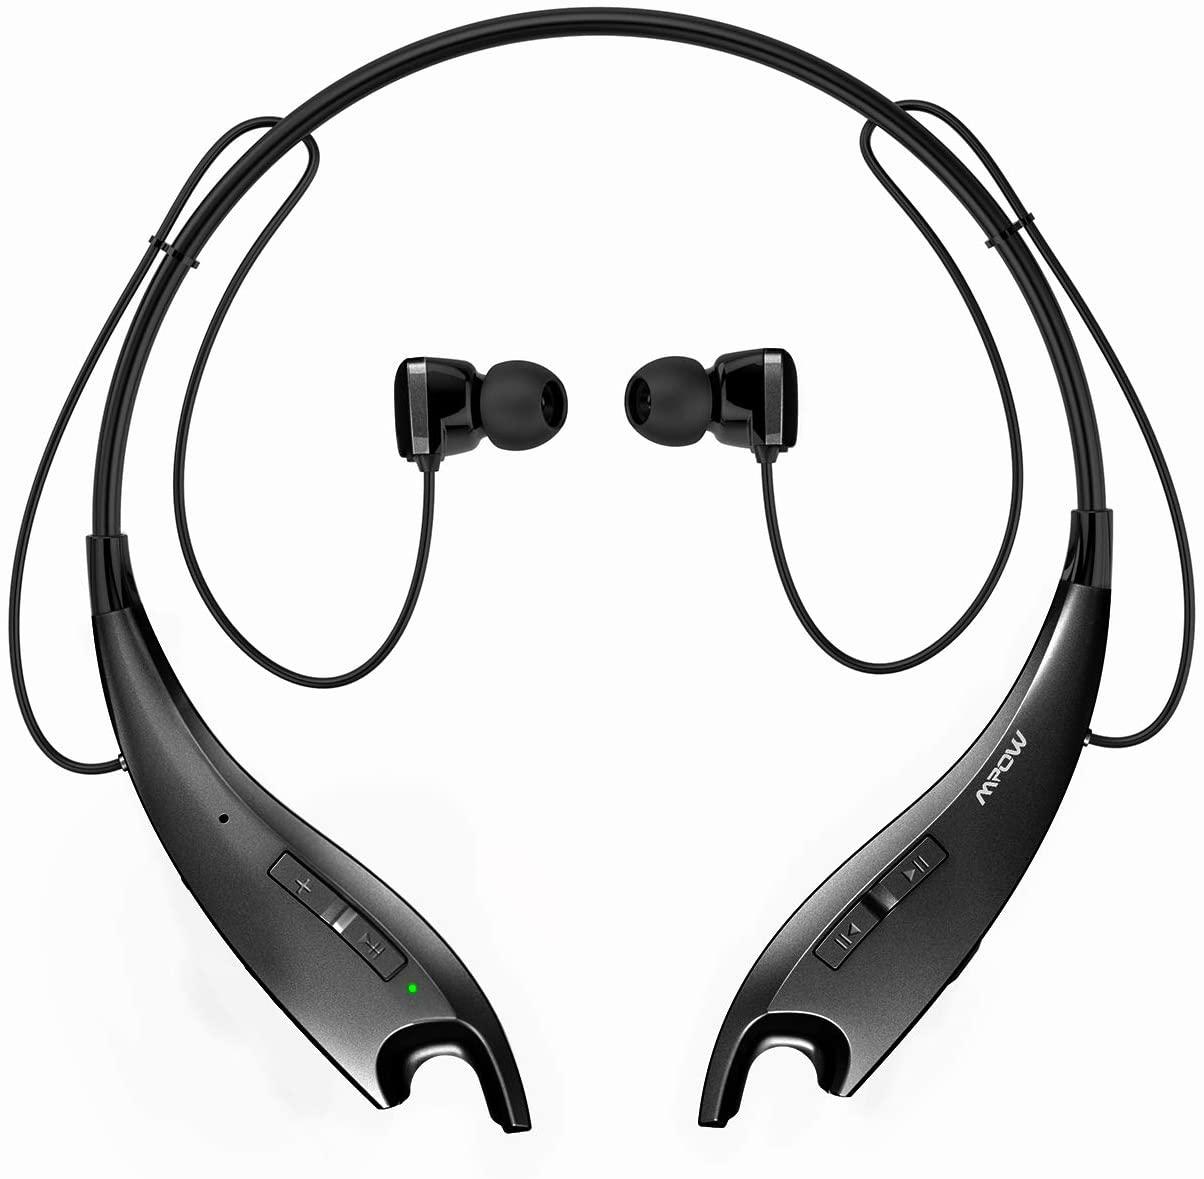 Mpow Jaws Upgraded Gen-3 Bluetooth Headphones